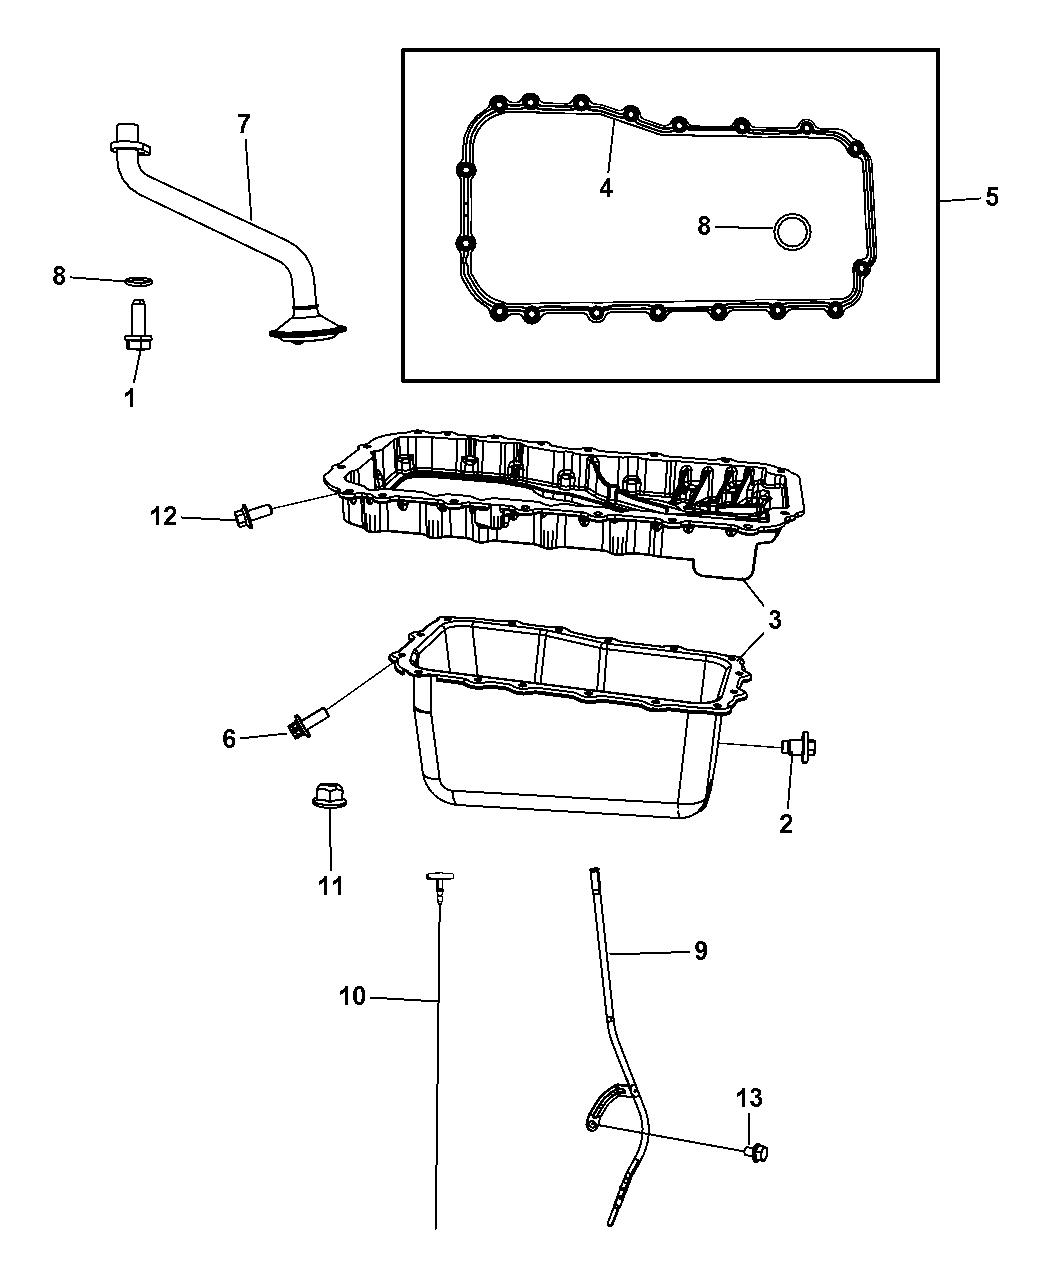 2009 Dodge Grand Caravan Engine Oil Pan & Engine Oil Level Indicator &  Related Parts